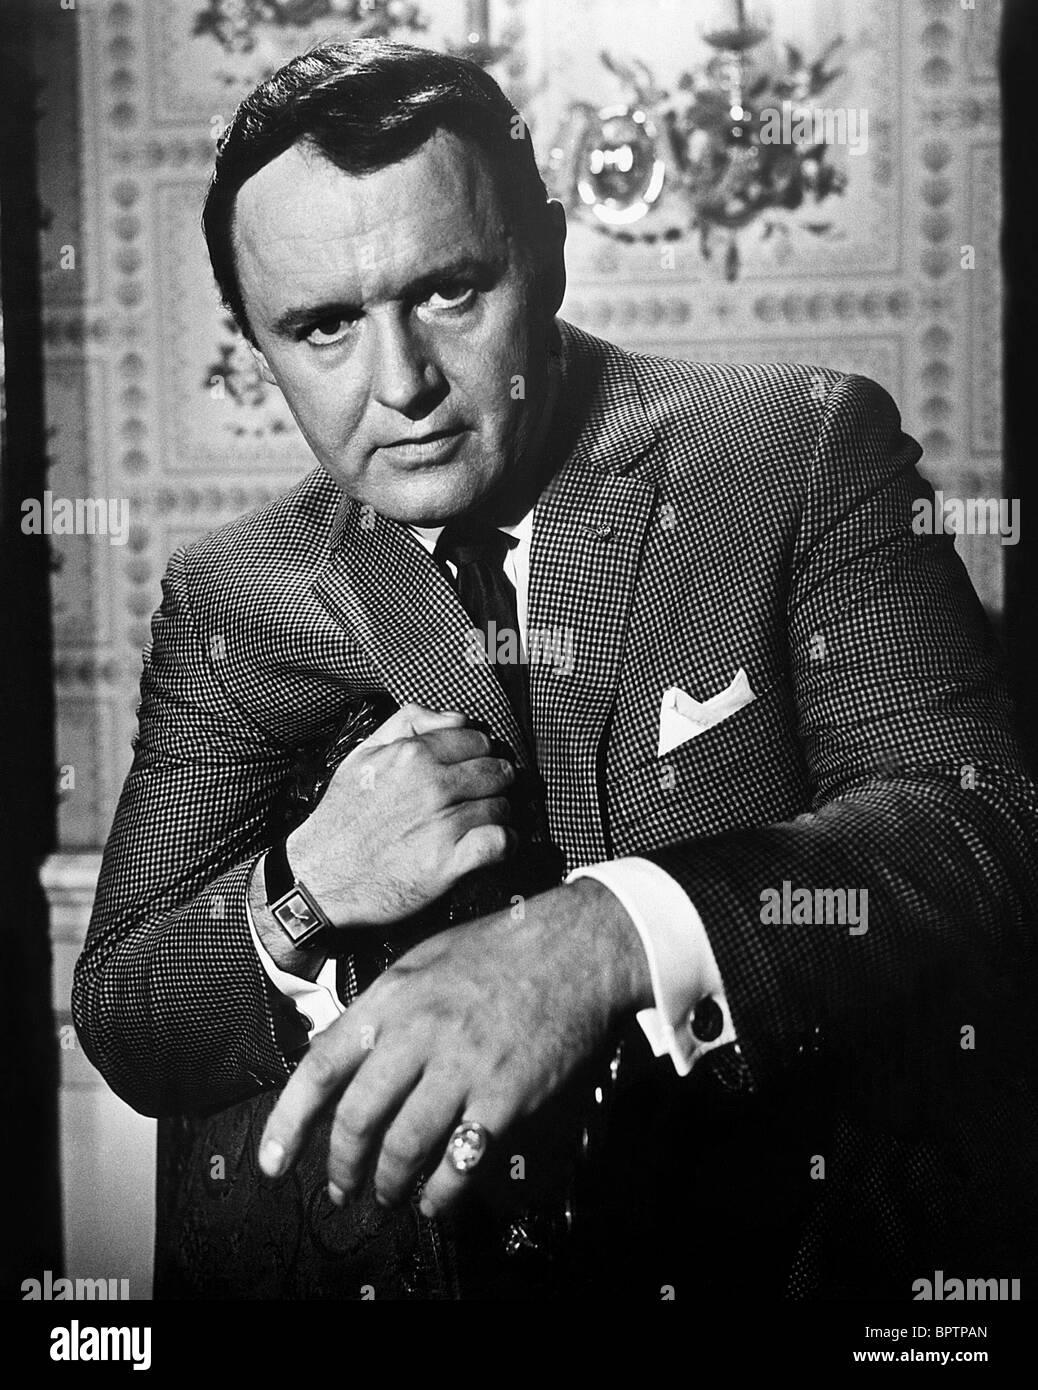 Rod Steiger Actor 1967 Stock Photo Alamy